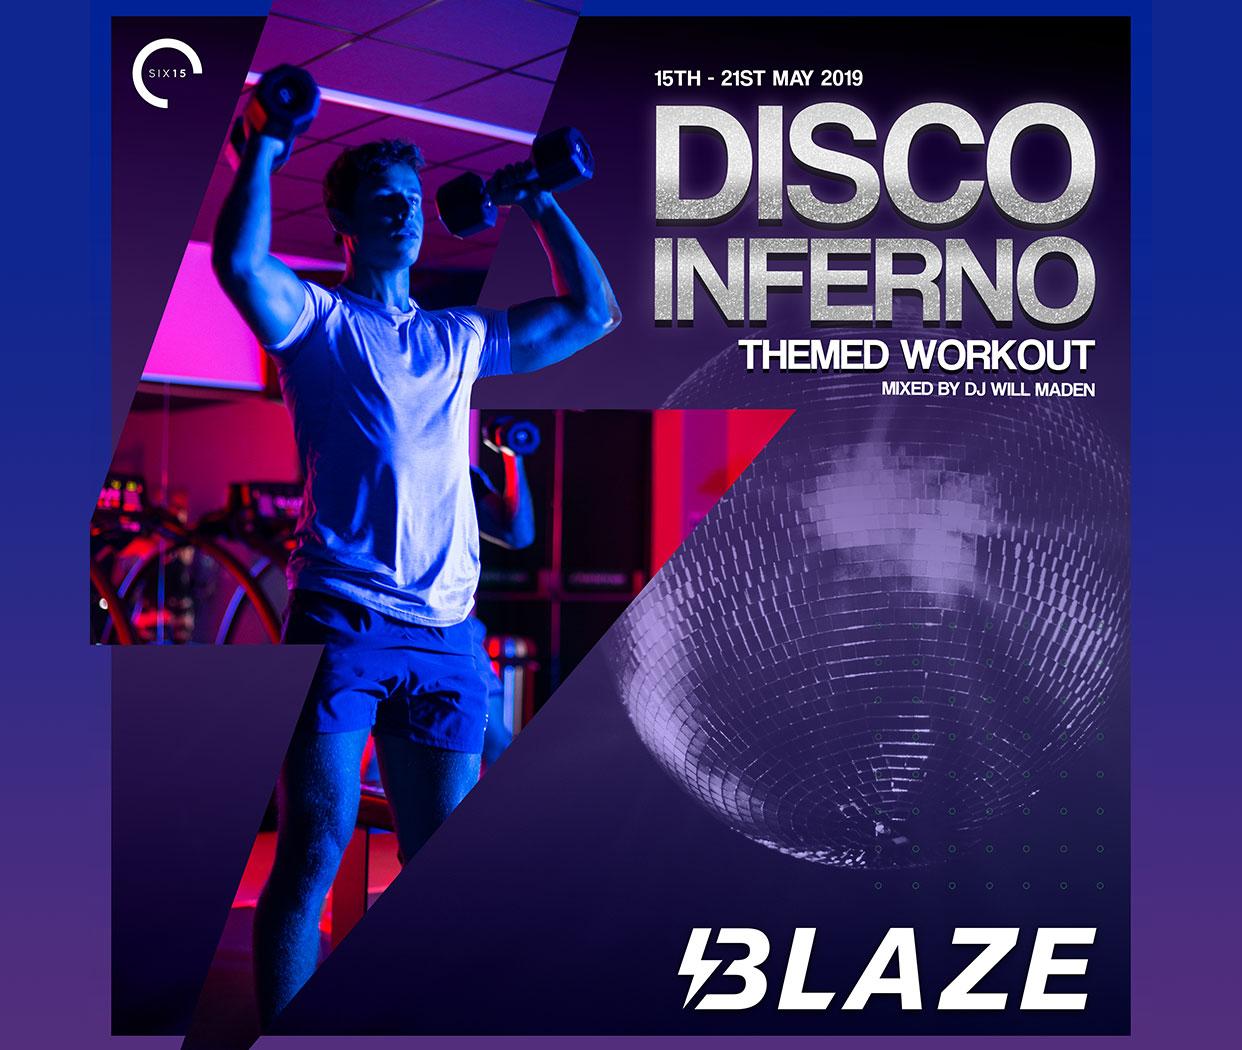 Blaze - Disco Inferno!